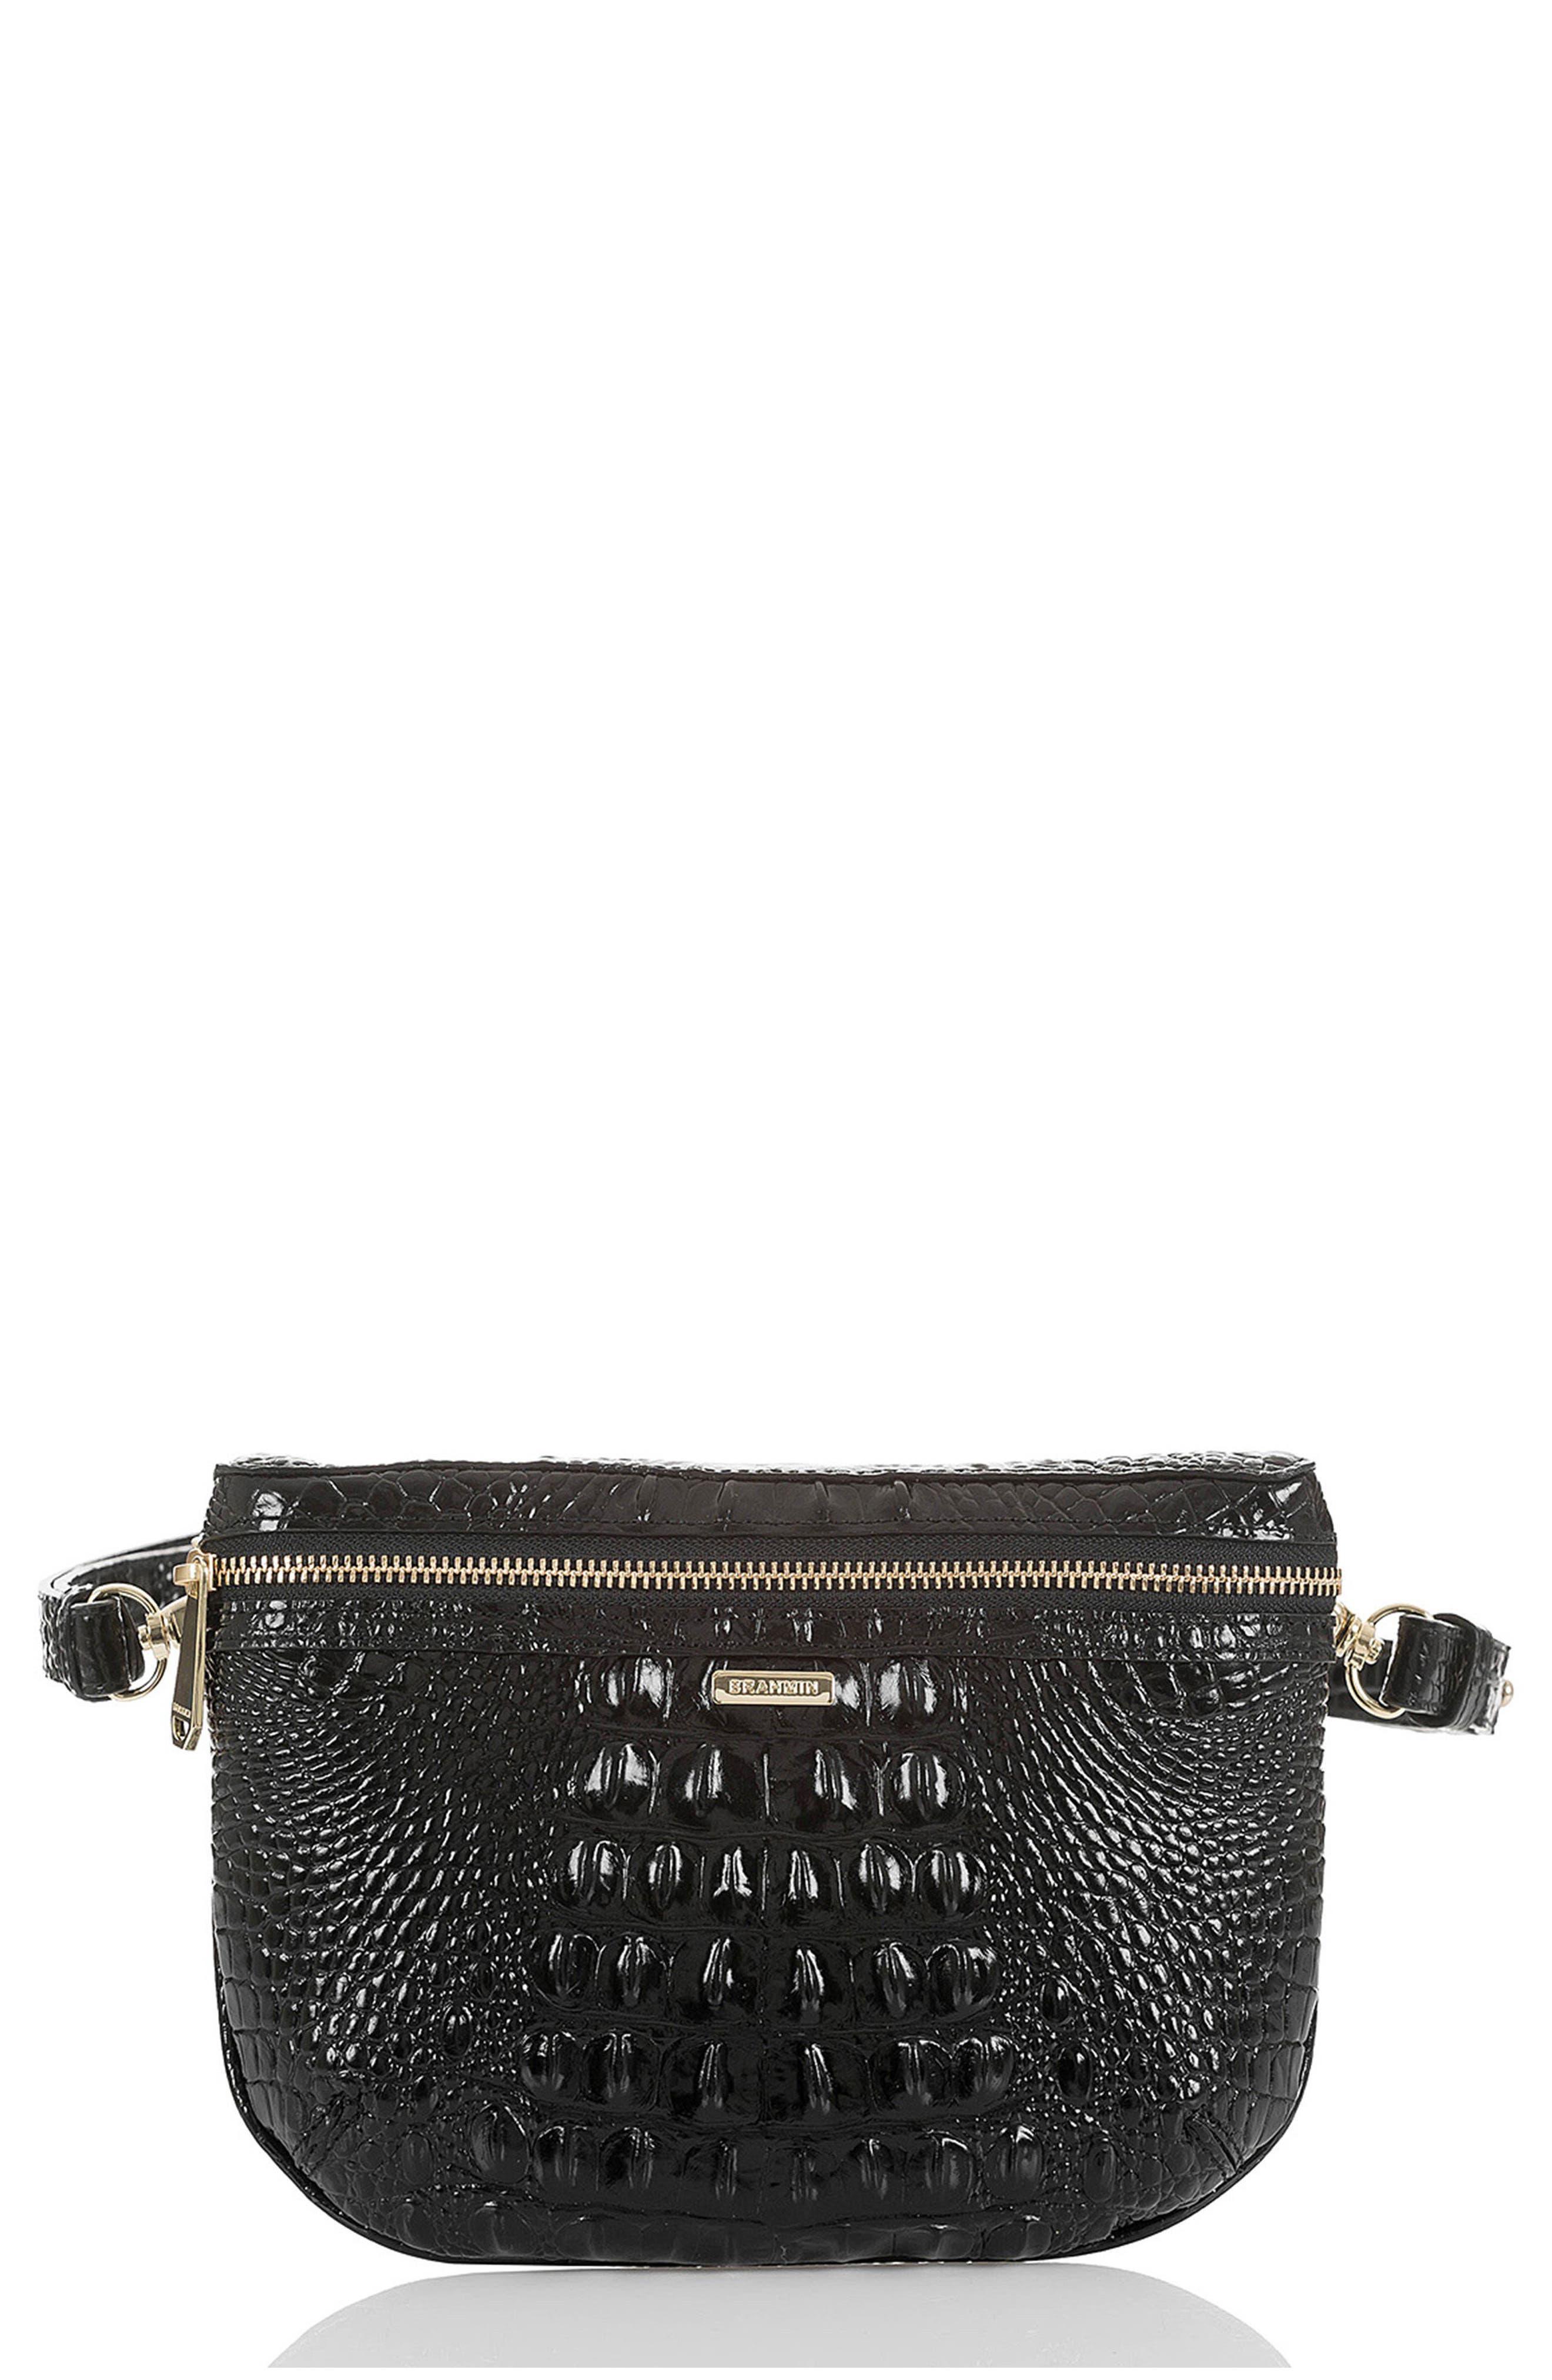 BRAHMIN, Croc Embossed Leather Belt Bag, Main thumbnail 1, color, BLACK